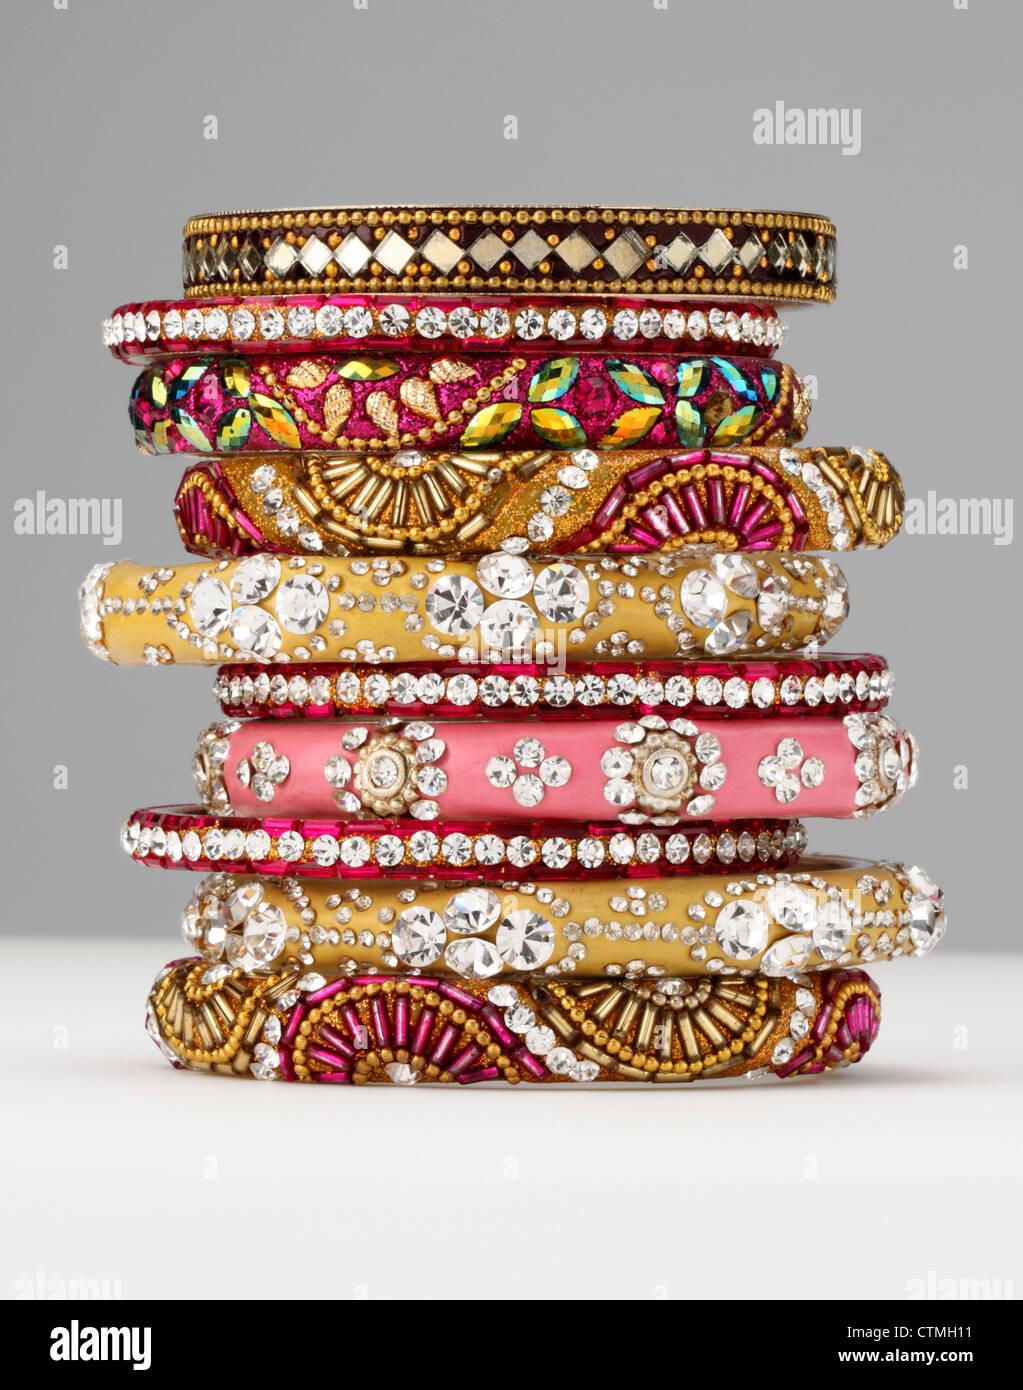 Modeschmuck. Ein Stapel von bunten Armbänder. Stockbild